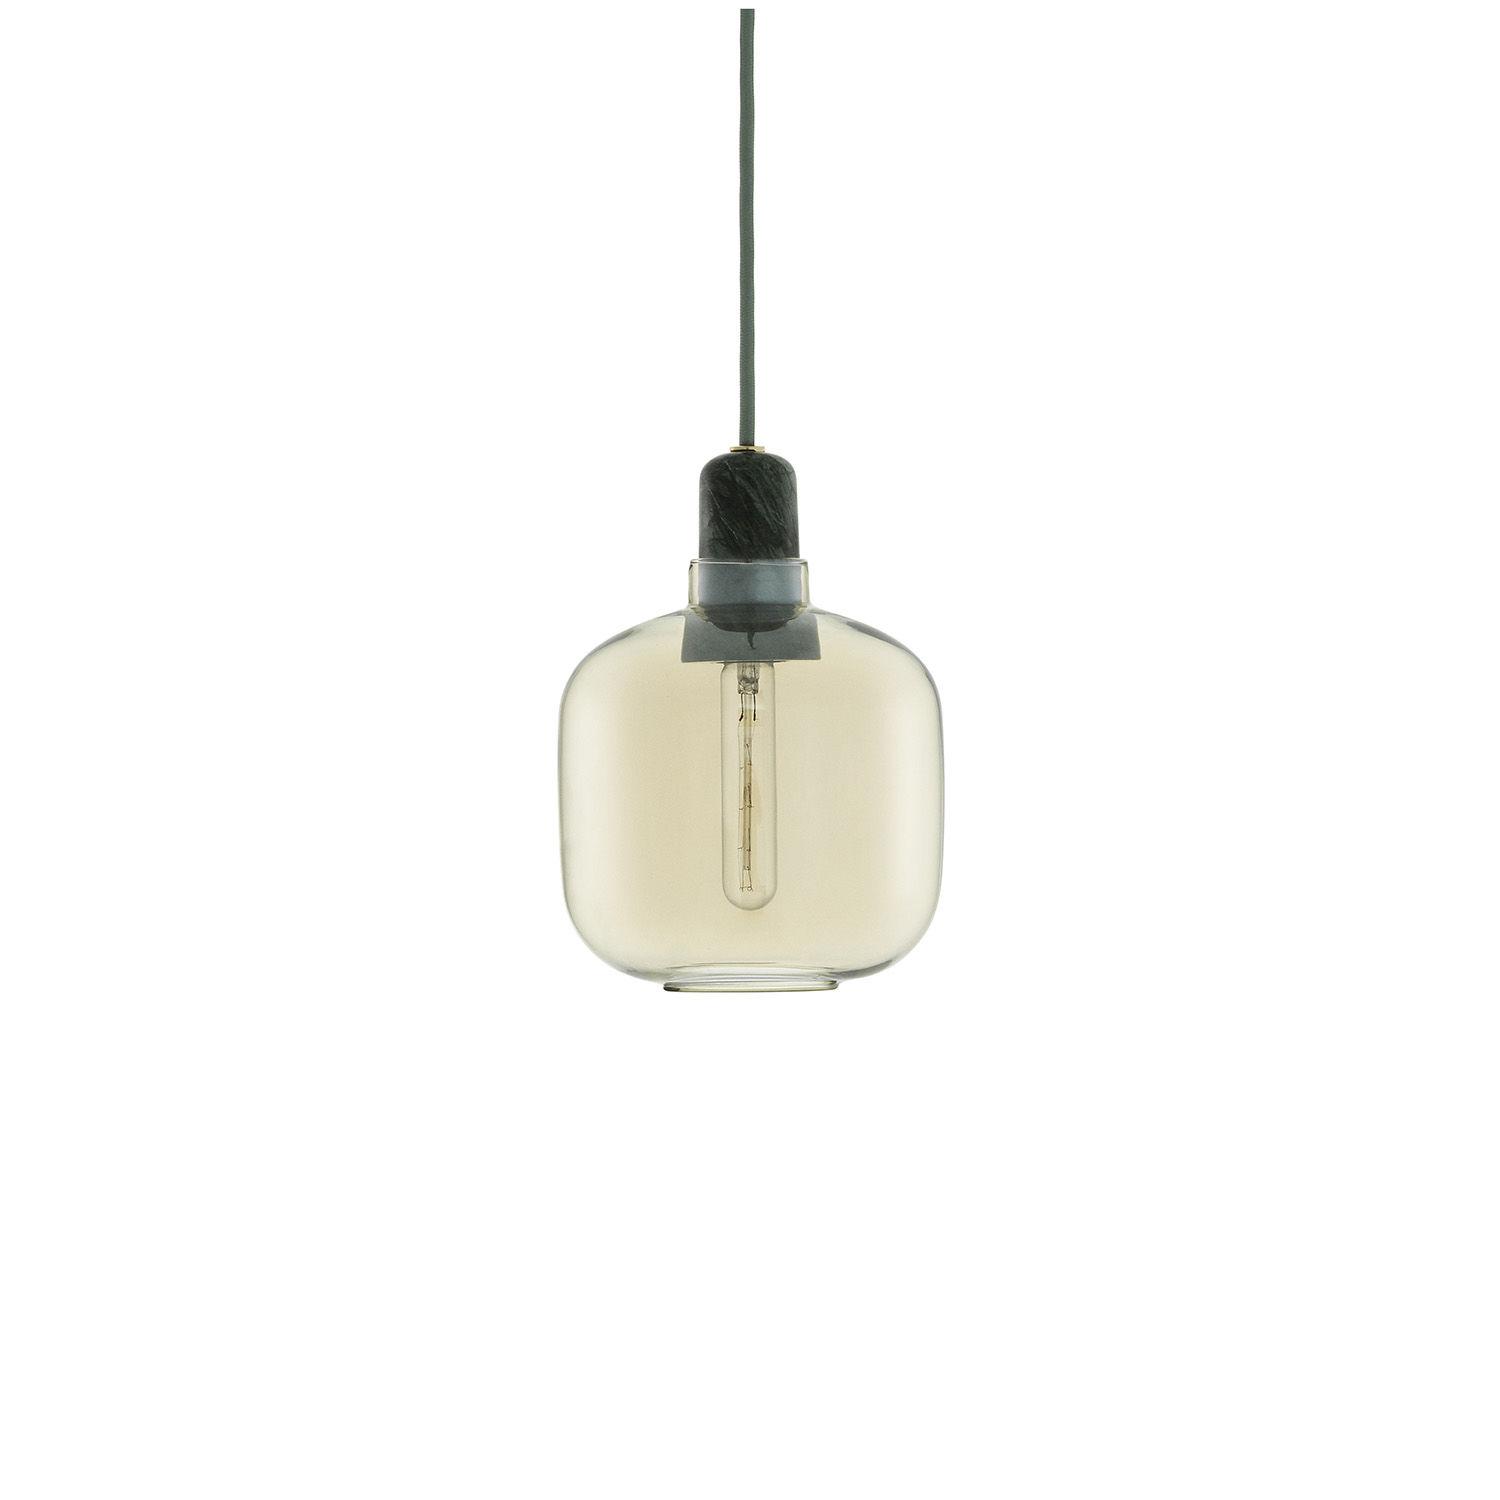 Amp hanglamp Normann Copenhagen klein goud groen